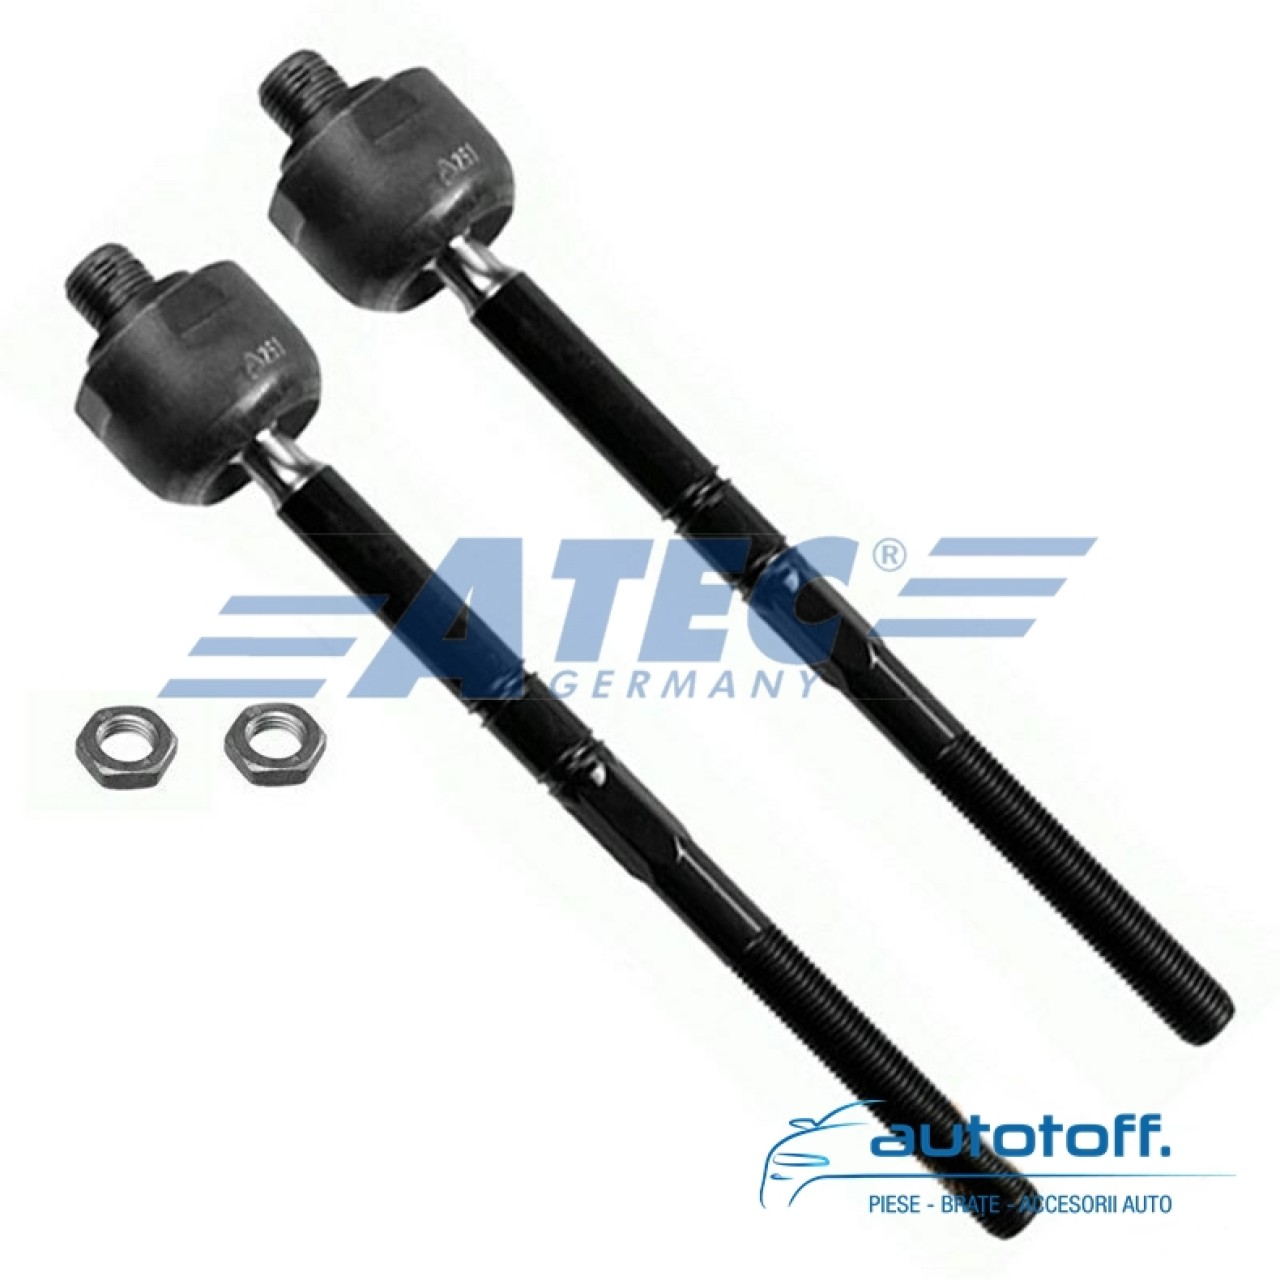 Kit 10 brate fata Mercedes Benz C W203 S203 CLK C209 Kompresor, CL203 Coupe A209 Cabriolet